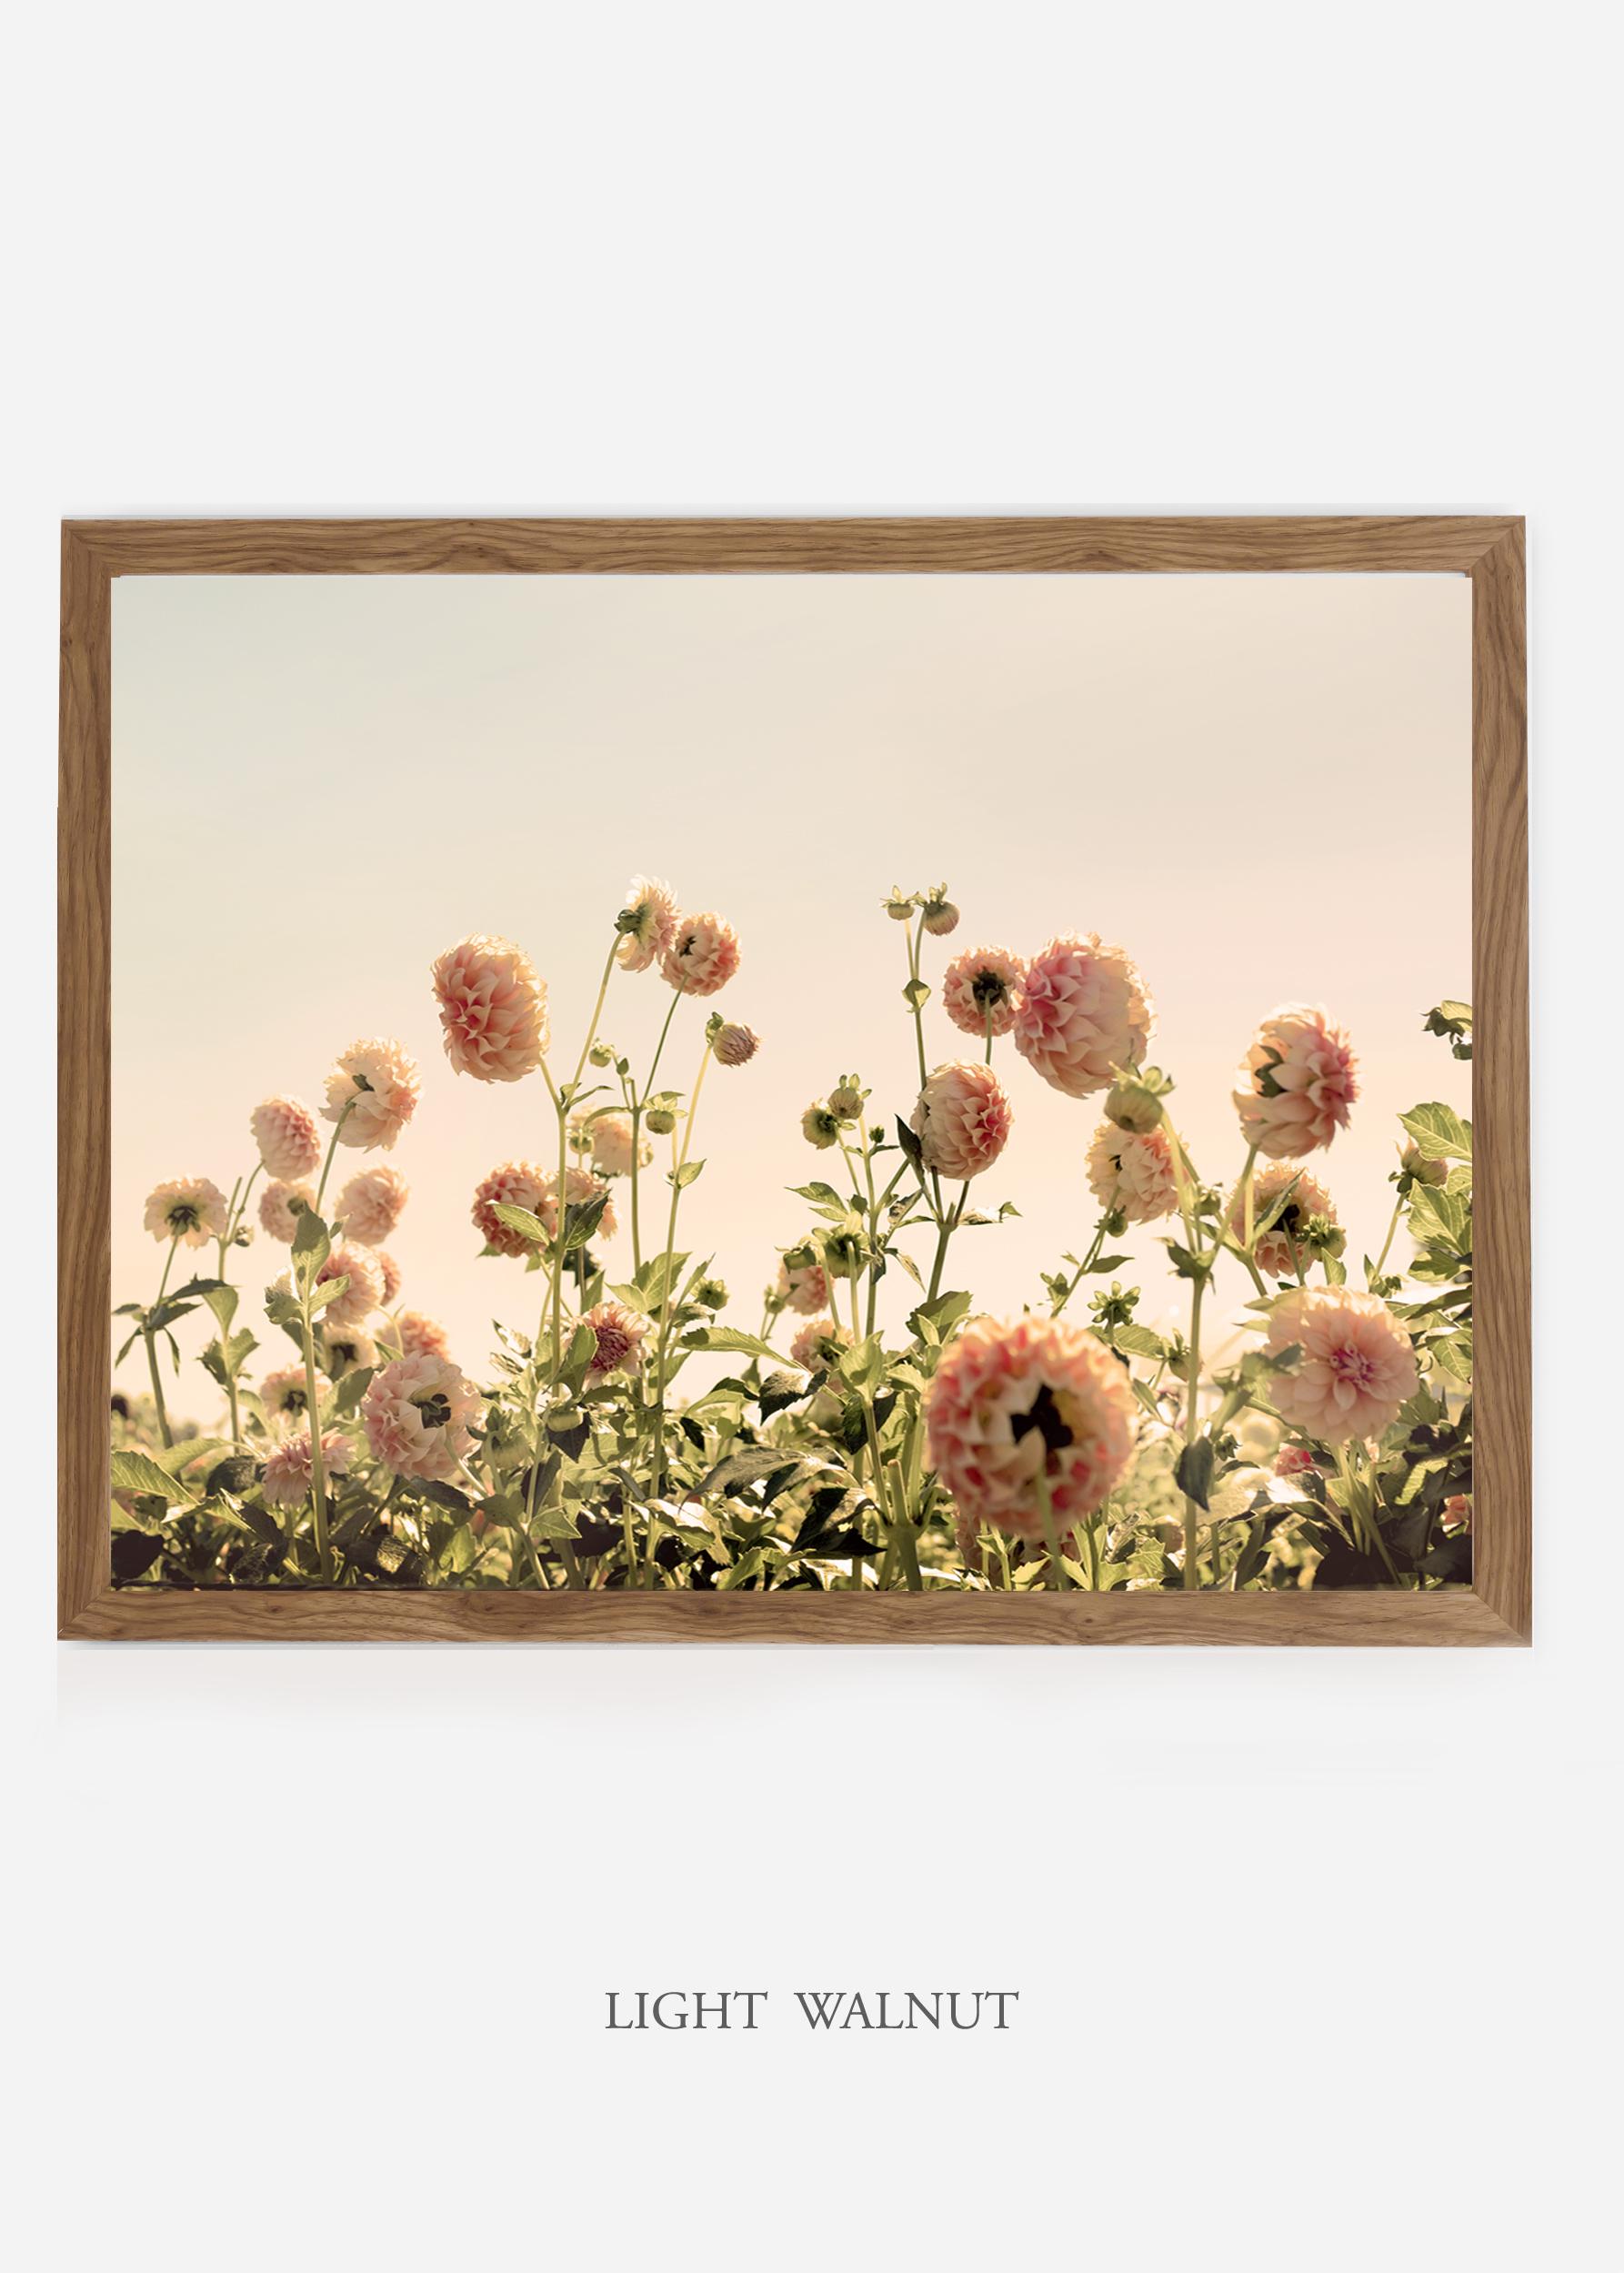 NoMat_LightWalnutFrame_DahliaNo.1_WilderCalifornia_Art_Floral_Homedecor_Prints_Dahlia_Botanical_Artwork_Interiordesign.jpg